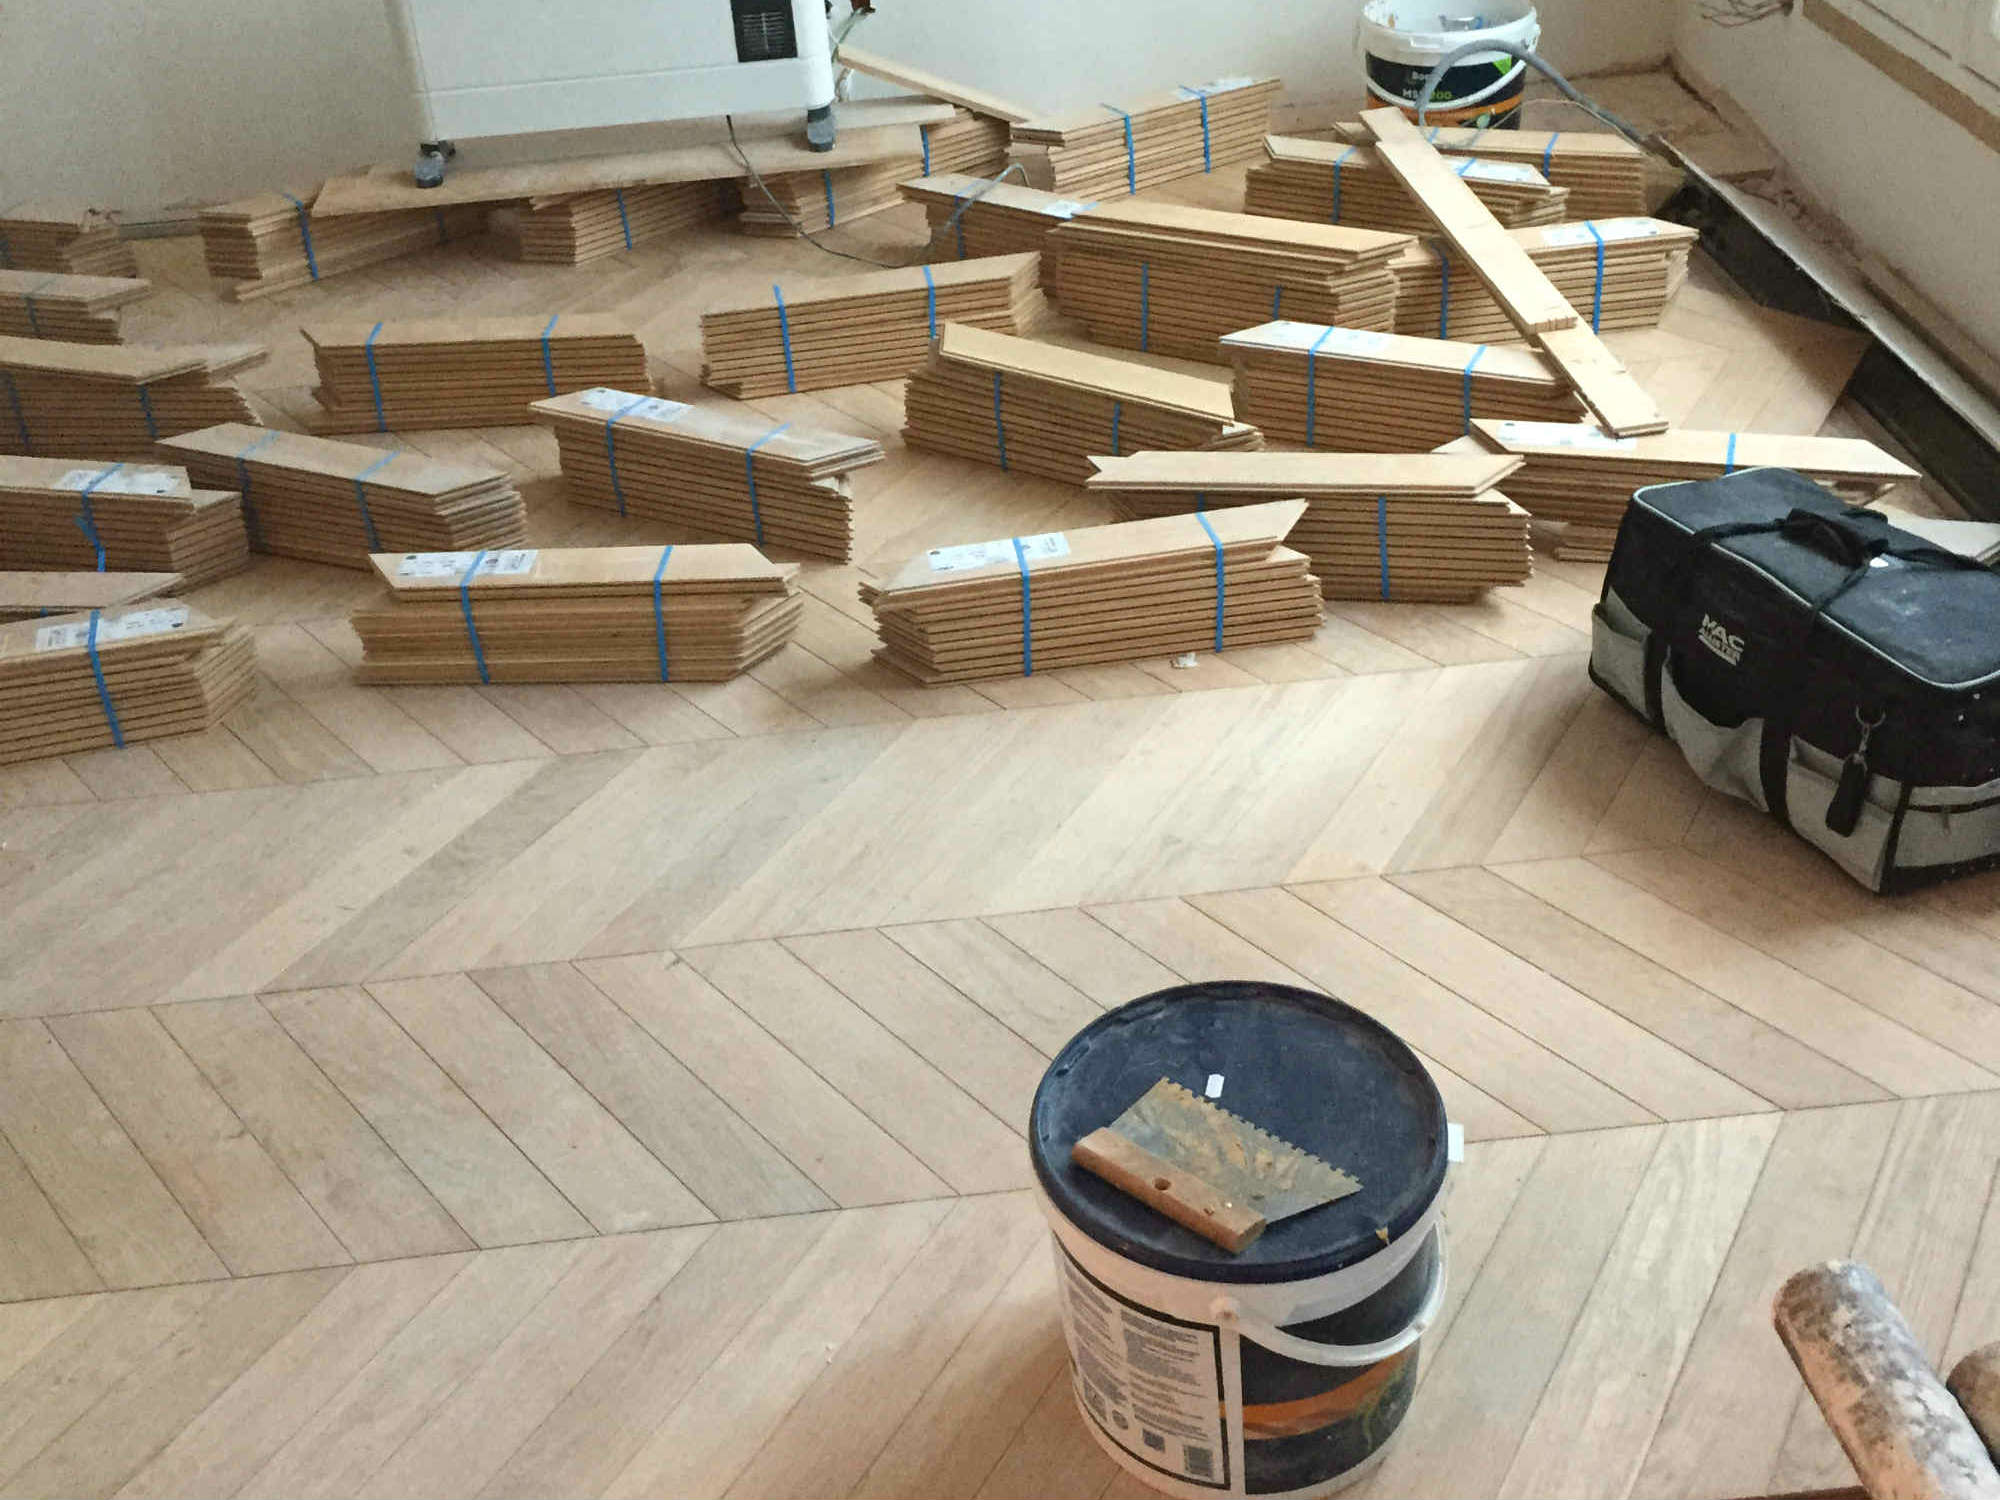 2016 travaux renovation appartement transformation F2 en F3 Paris rue Damremont_Eolh btp france